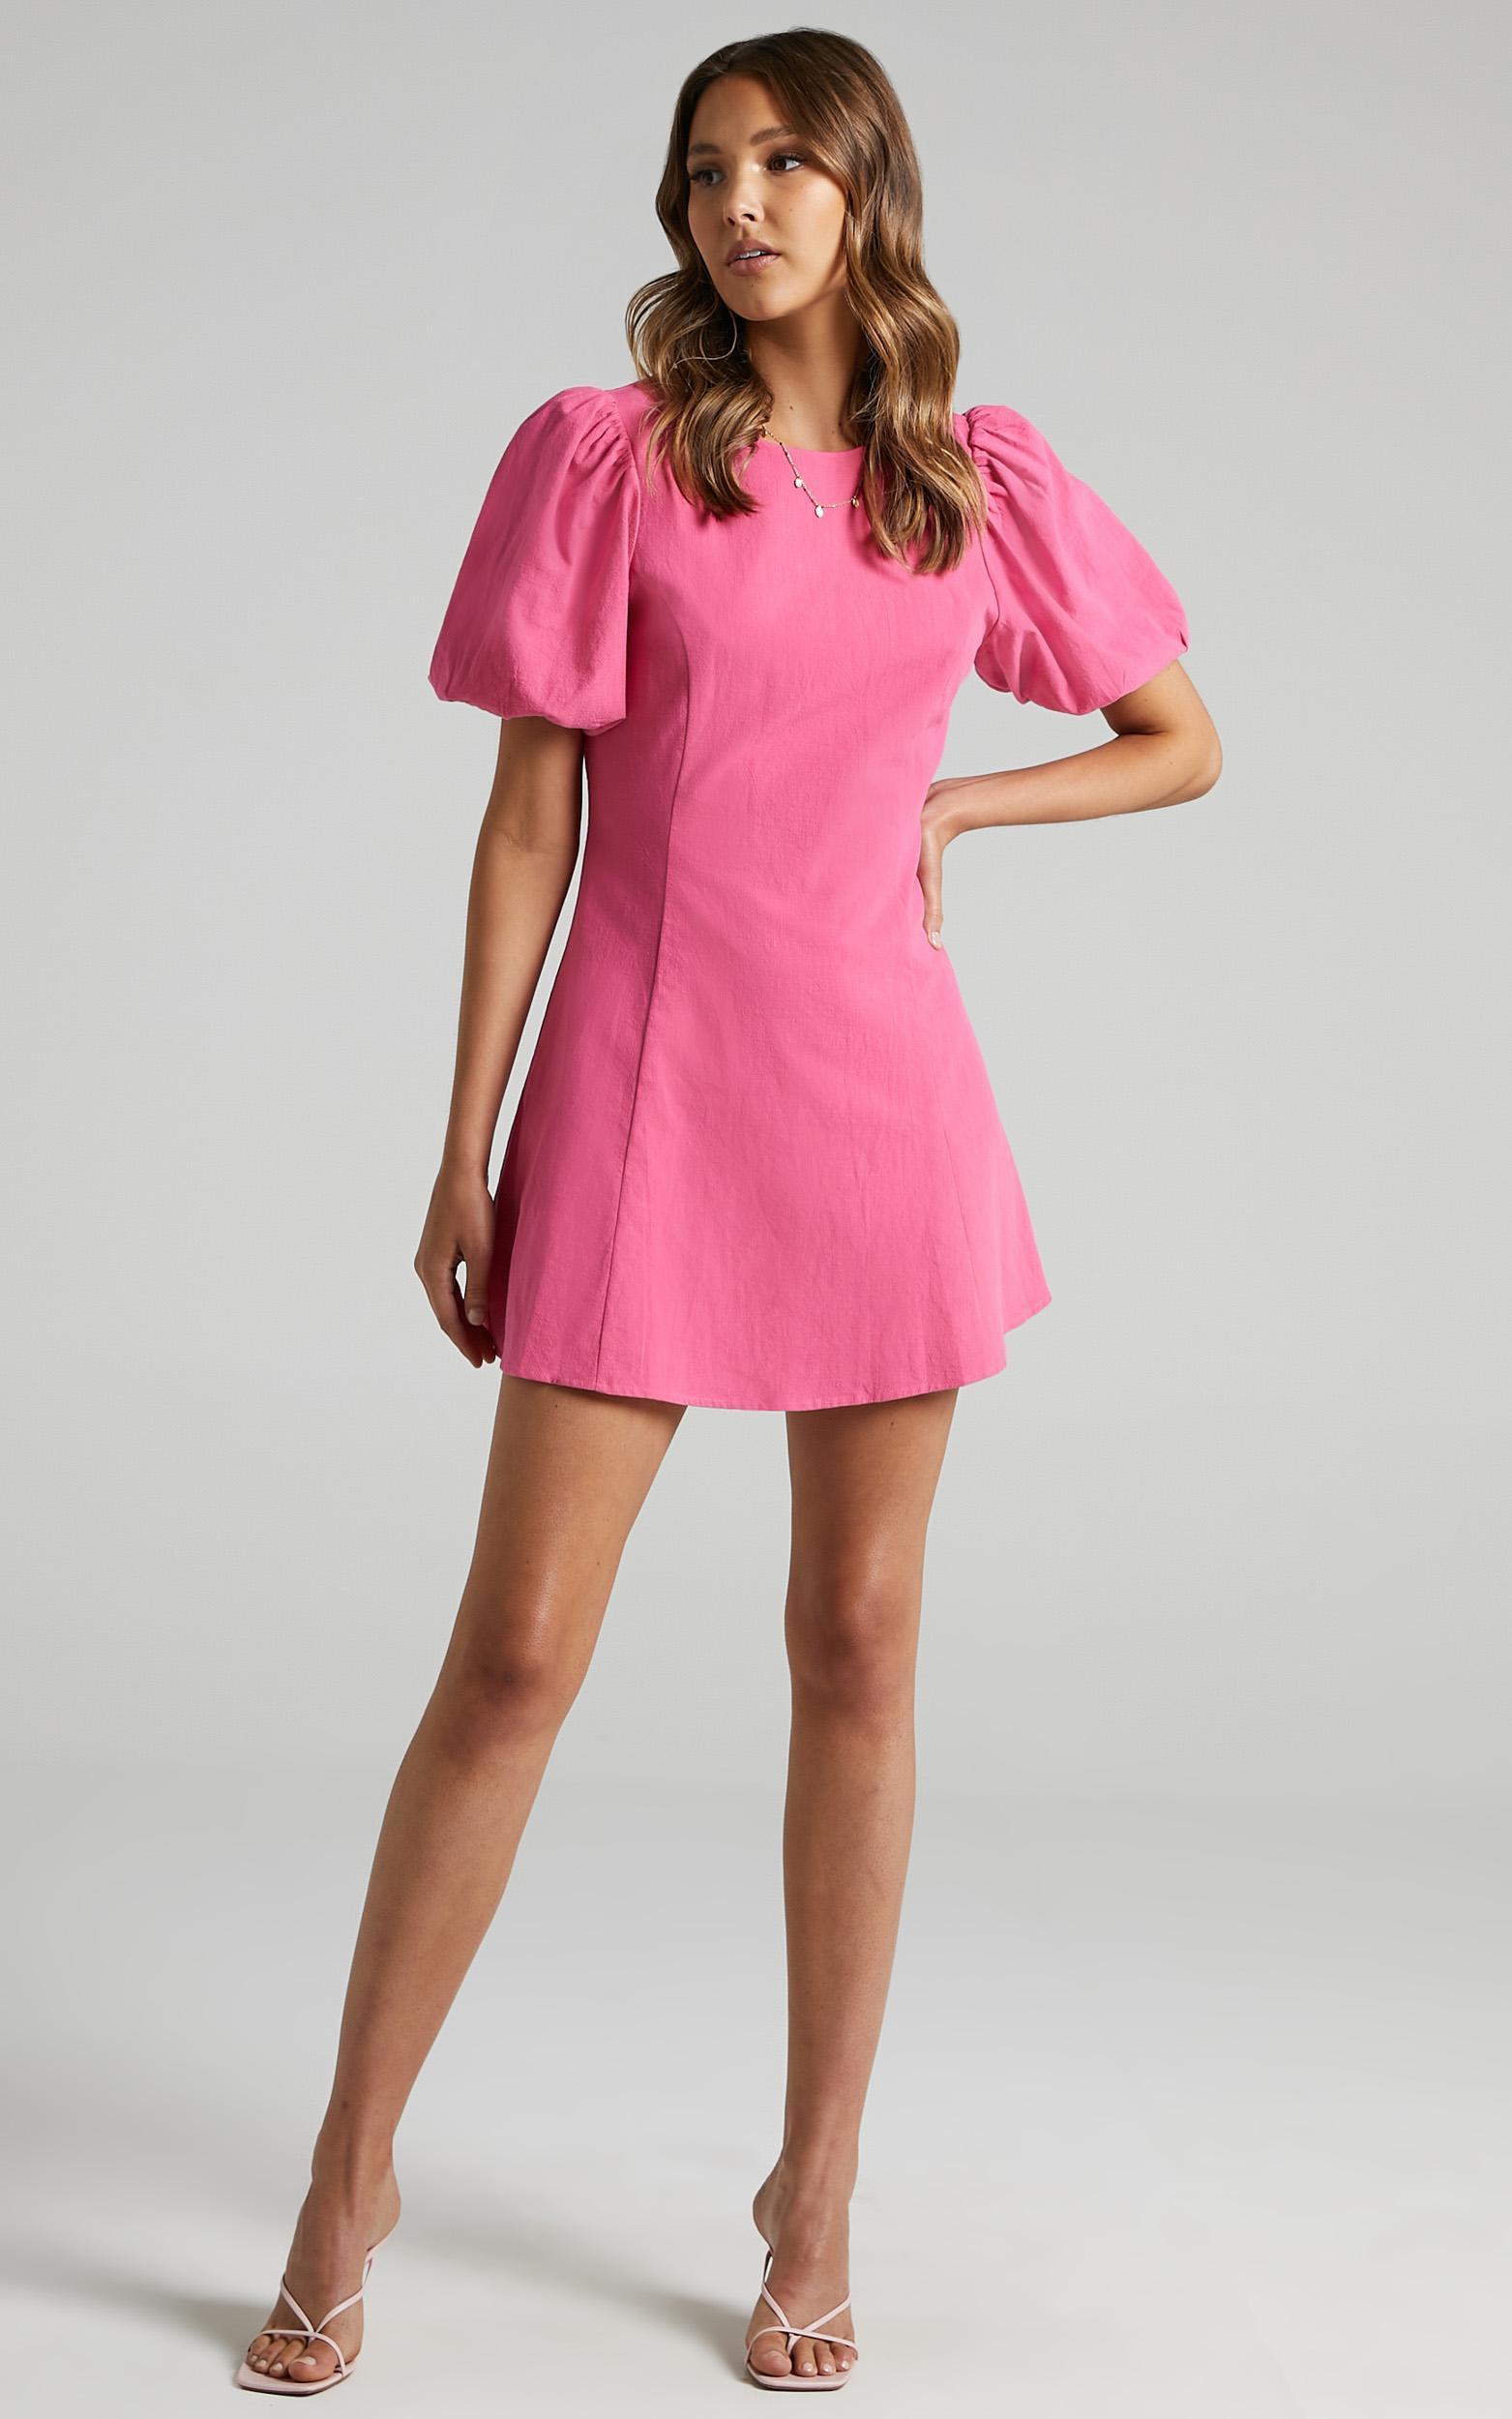 Bastina Dress in Bubblegum Pink - 6 (XS), Pink, hi-res image number null